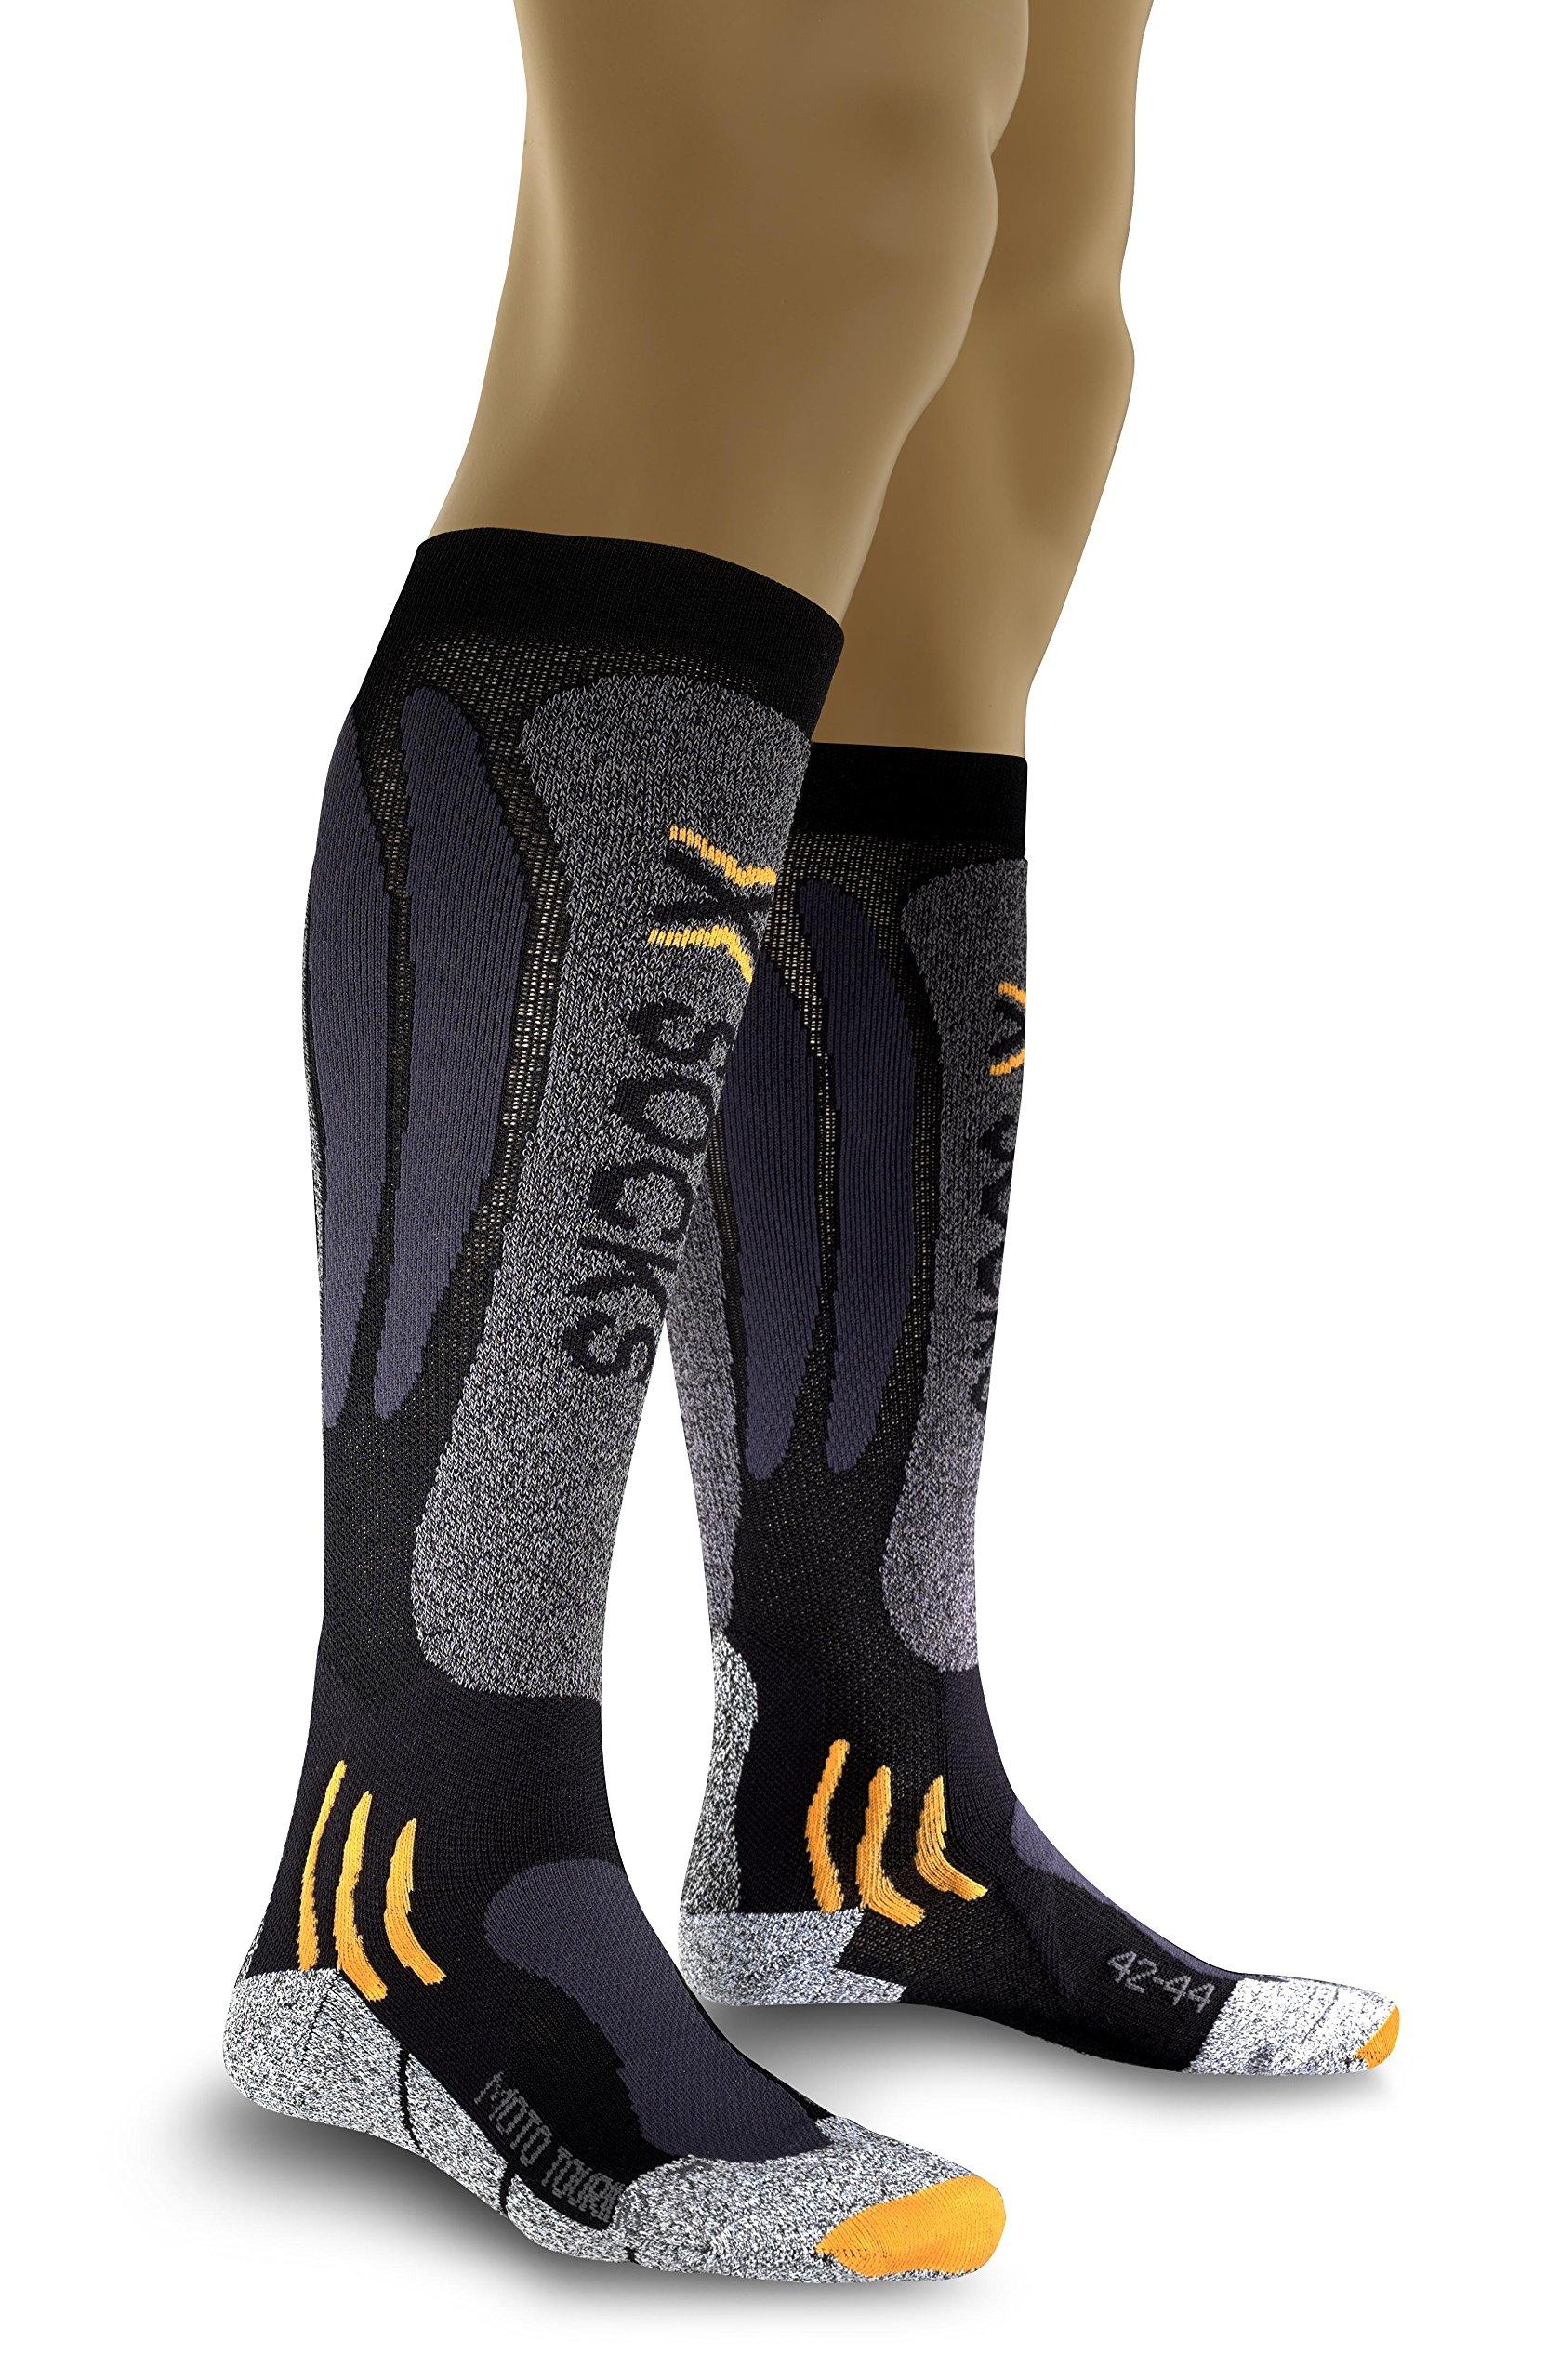 X-Socks Moto Touring long Black- Anthracite, Size:39/41